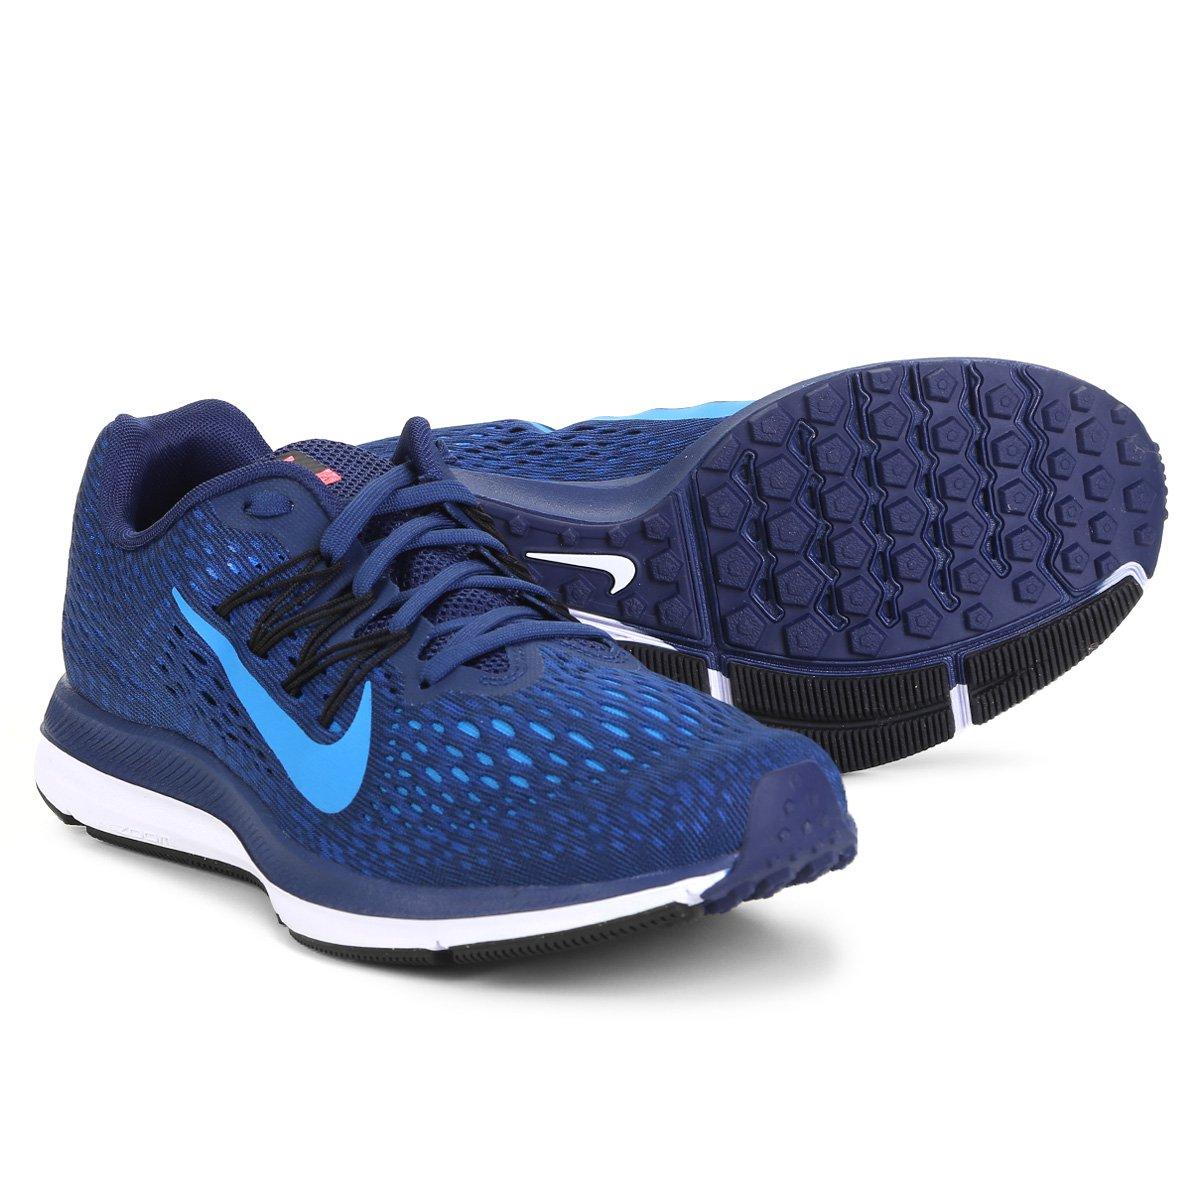 220f4e6a5f1 Tênis Nike Zoom Winflo 5 Masculino - Compre Agora